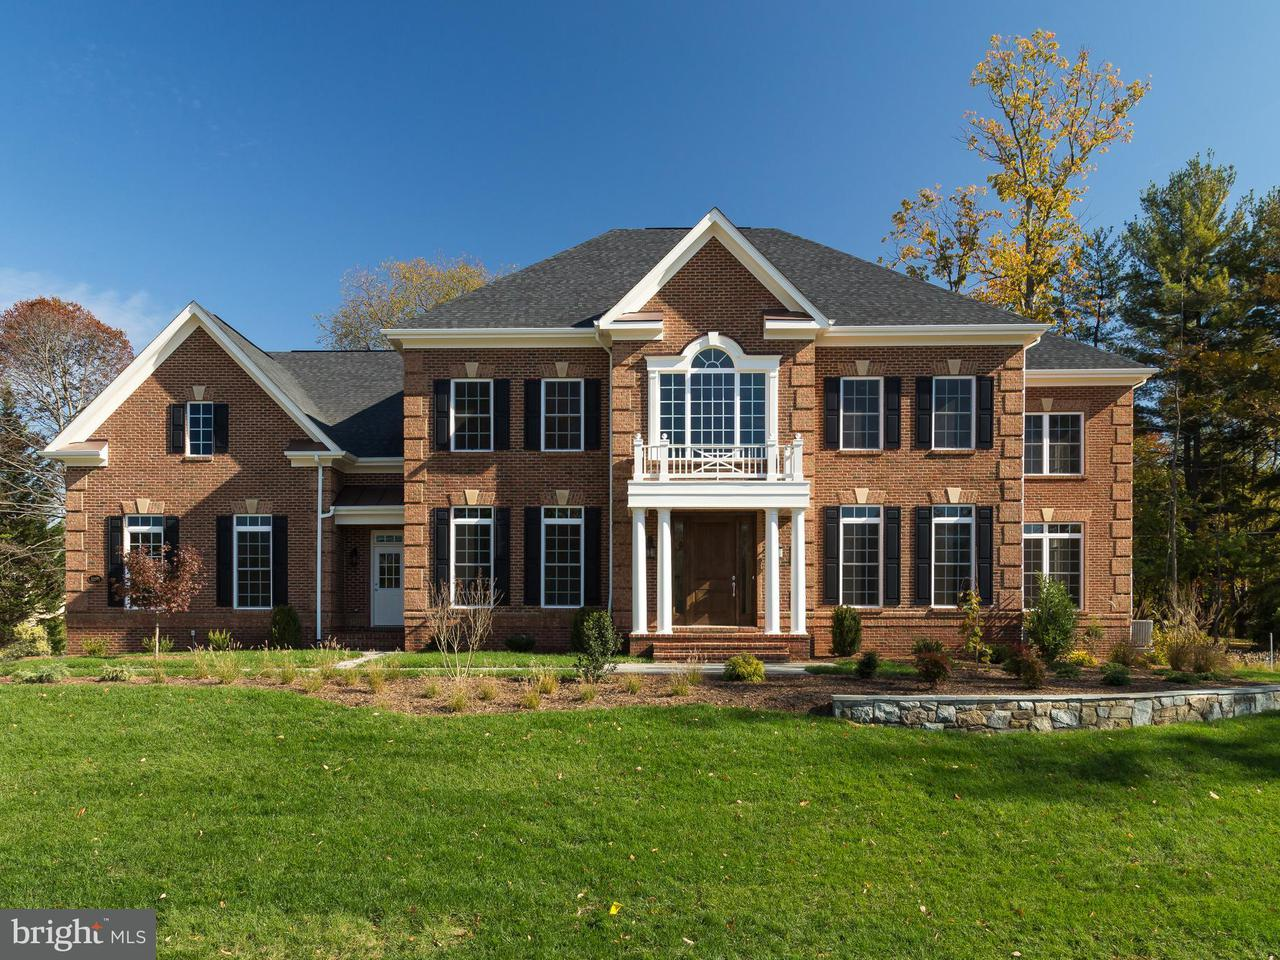 Single Family Home for Sale at 11191 Branton Lane 11191 Branton Lane Great Falls, Virginia 22066 United States